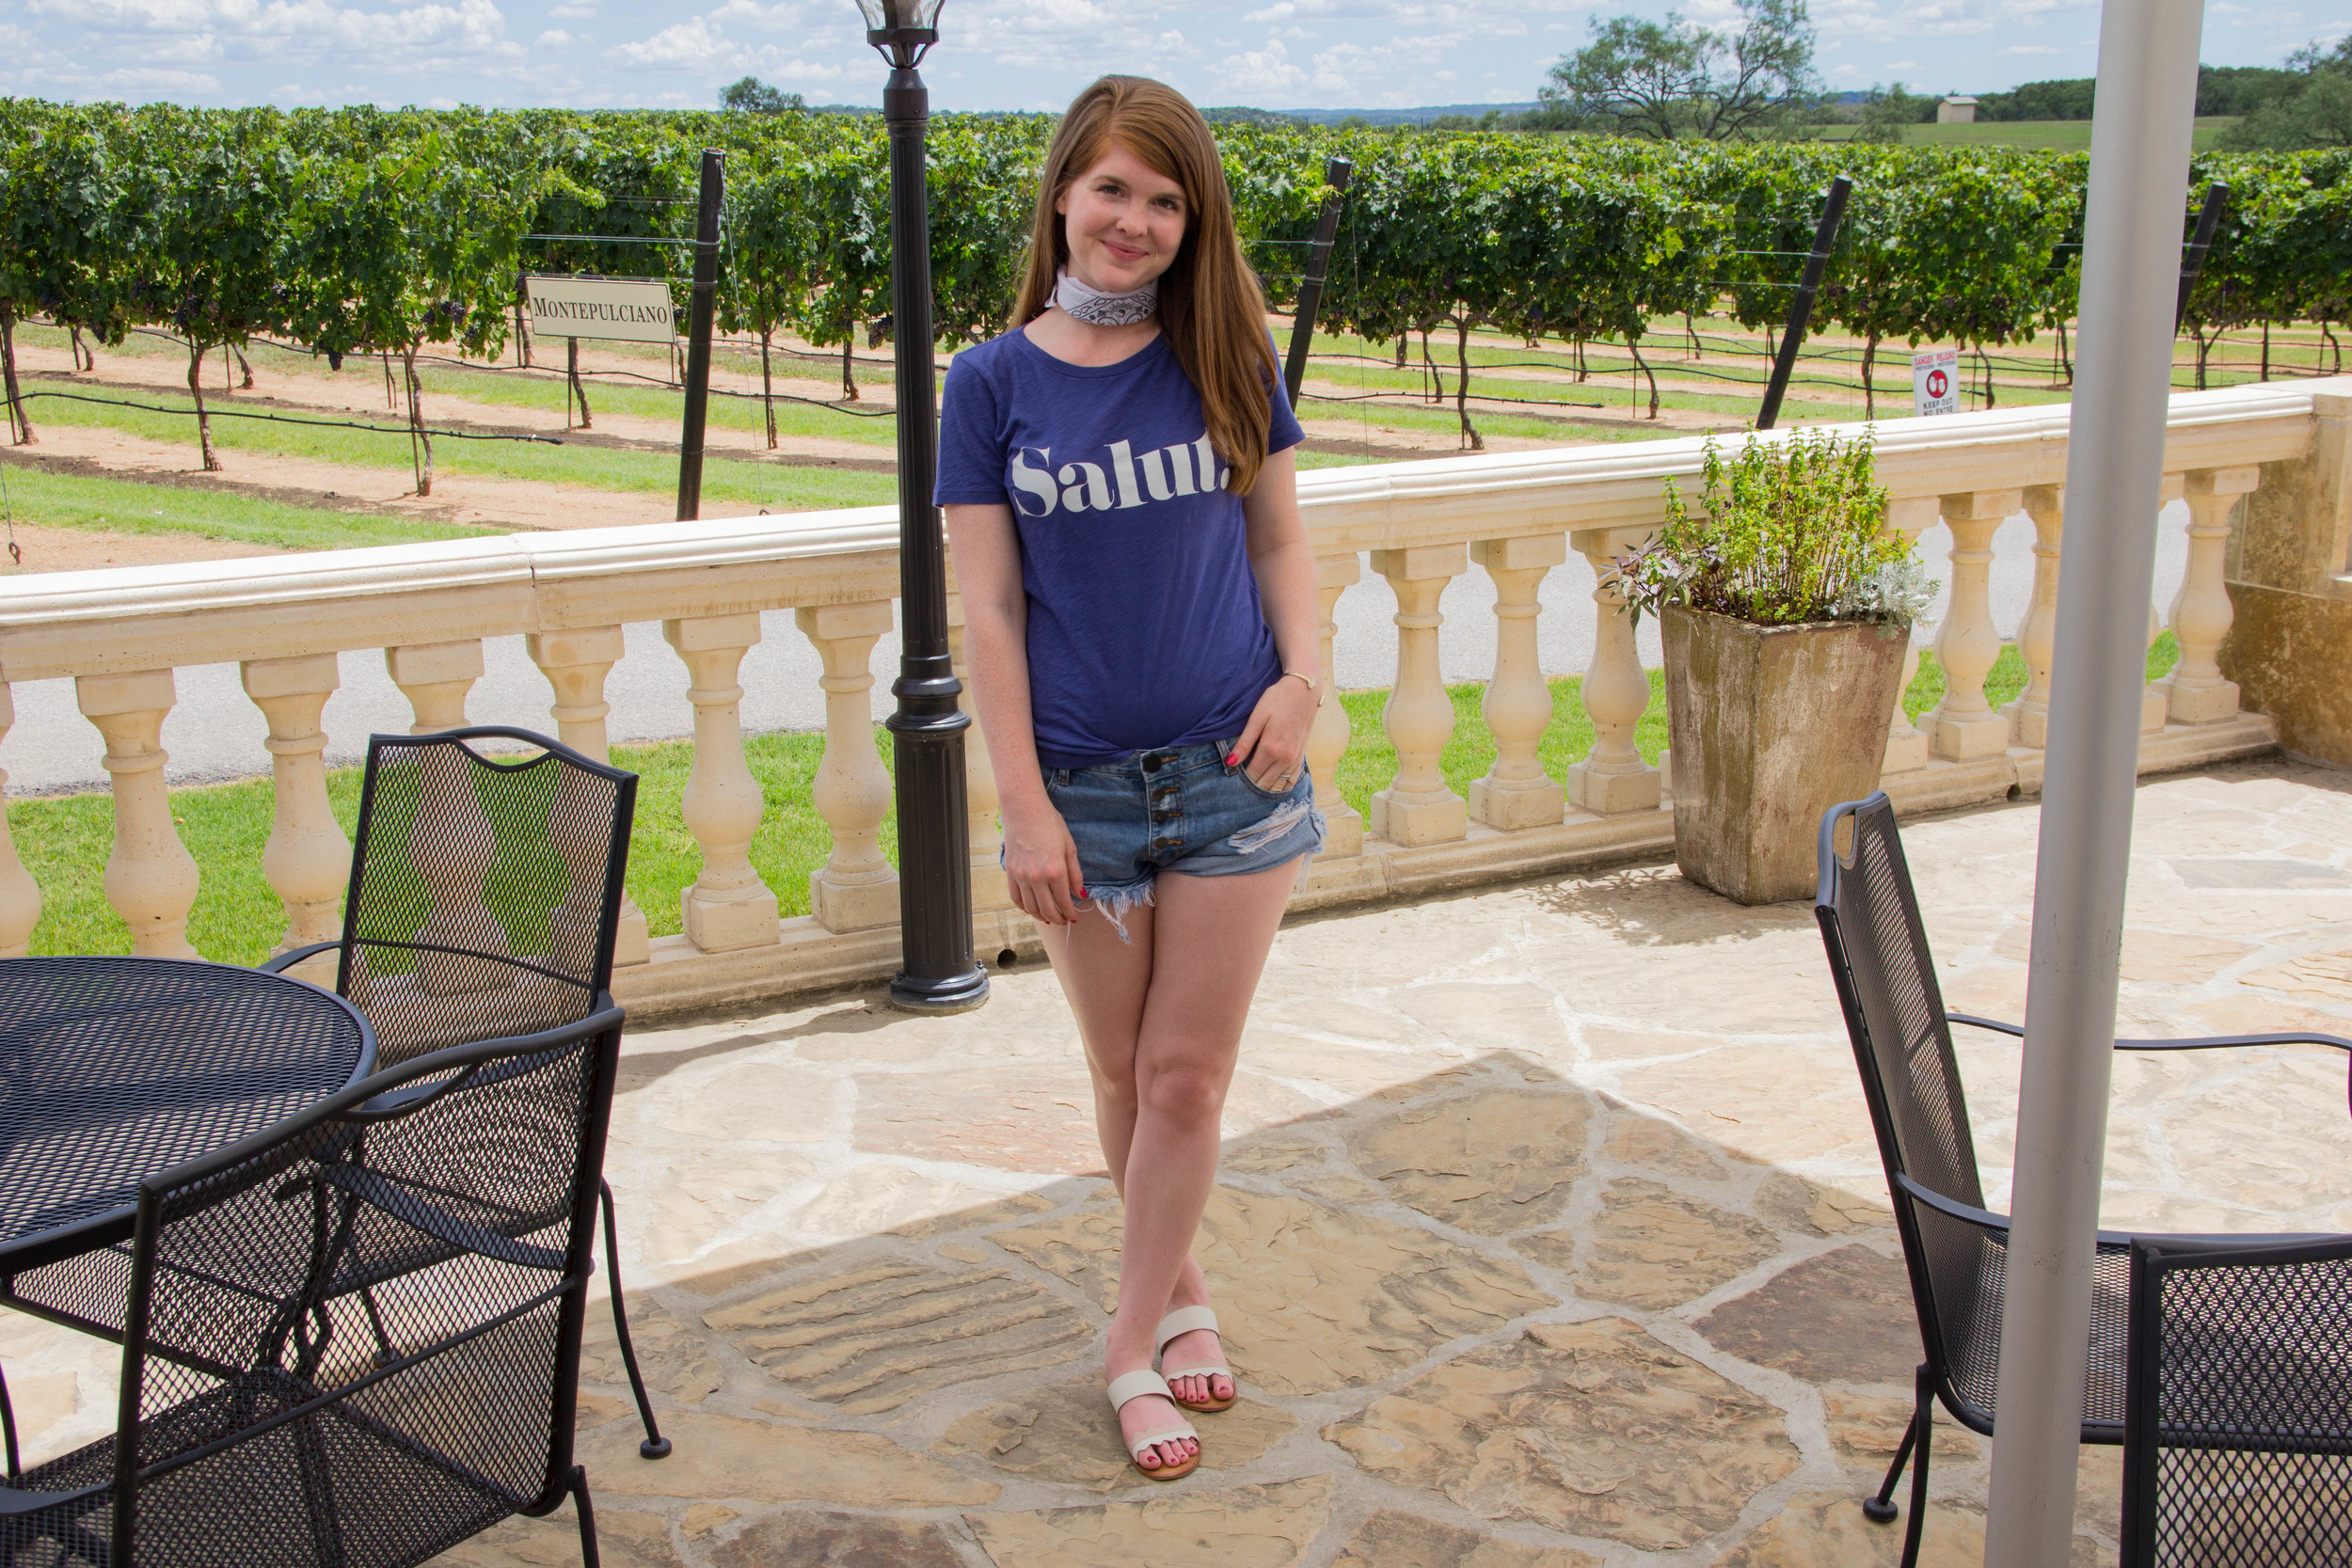 group trip to fredericksburg, texas hill country, what to do in fredericksburg, texas wineries, luckenbach texas, texas road trips, j crew salut tee, grapecreek